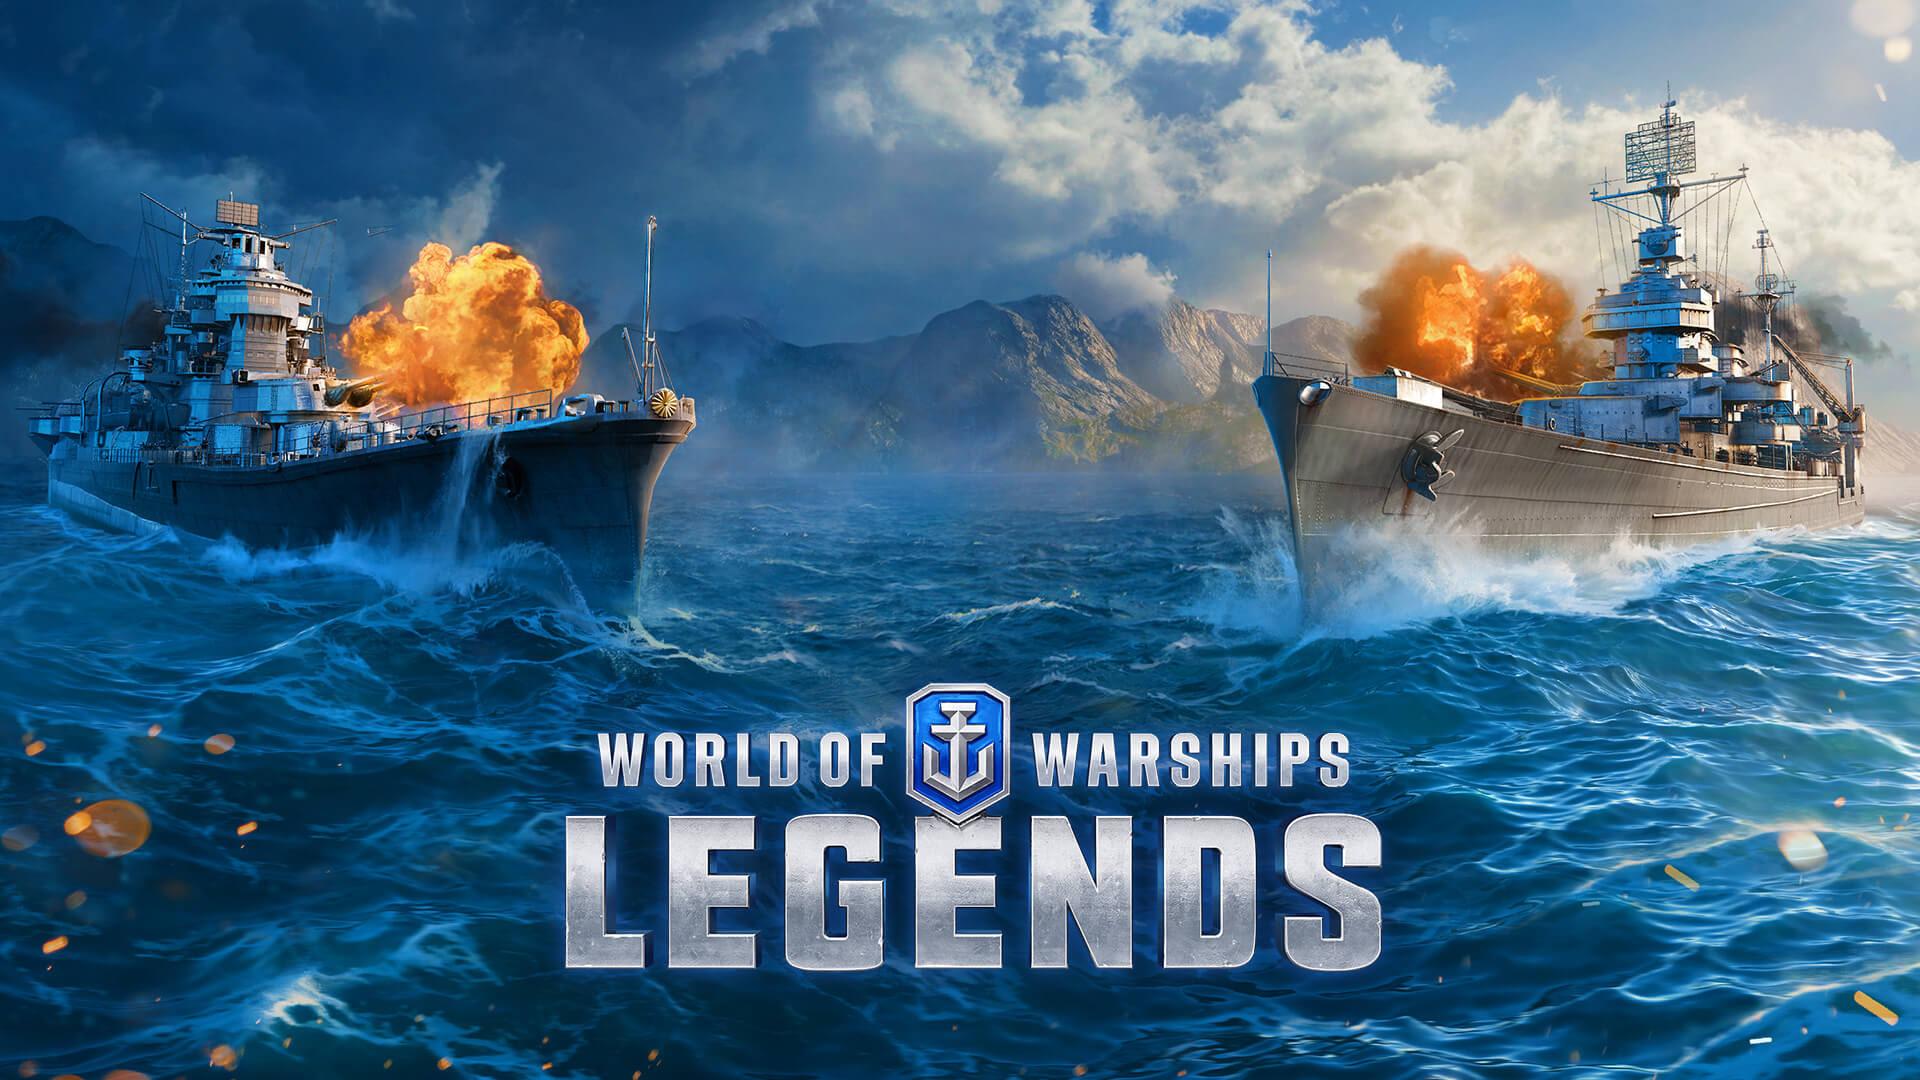 world of warships legends logo